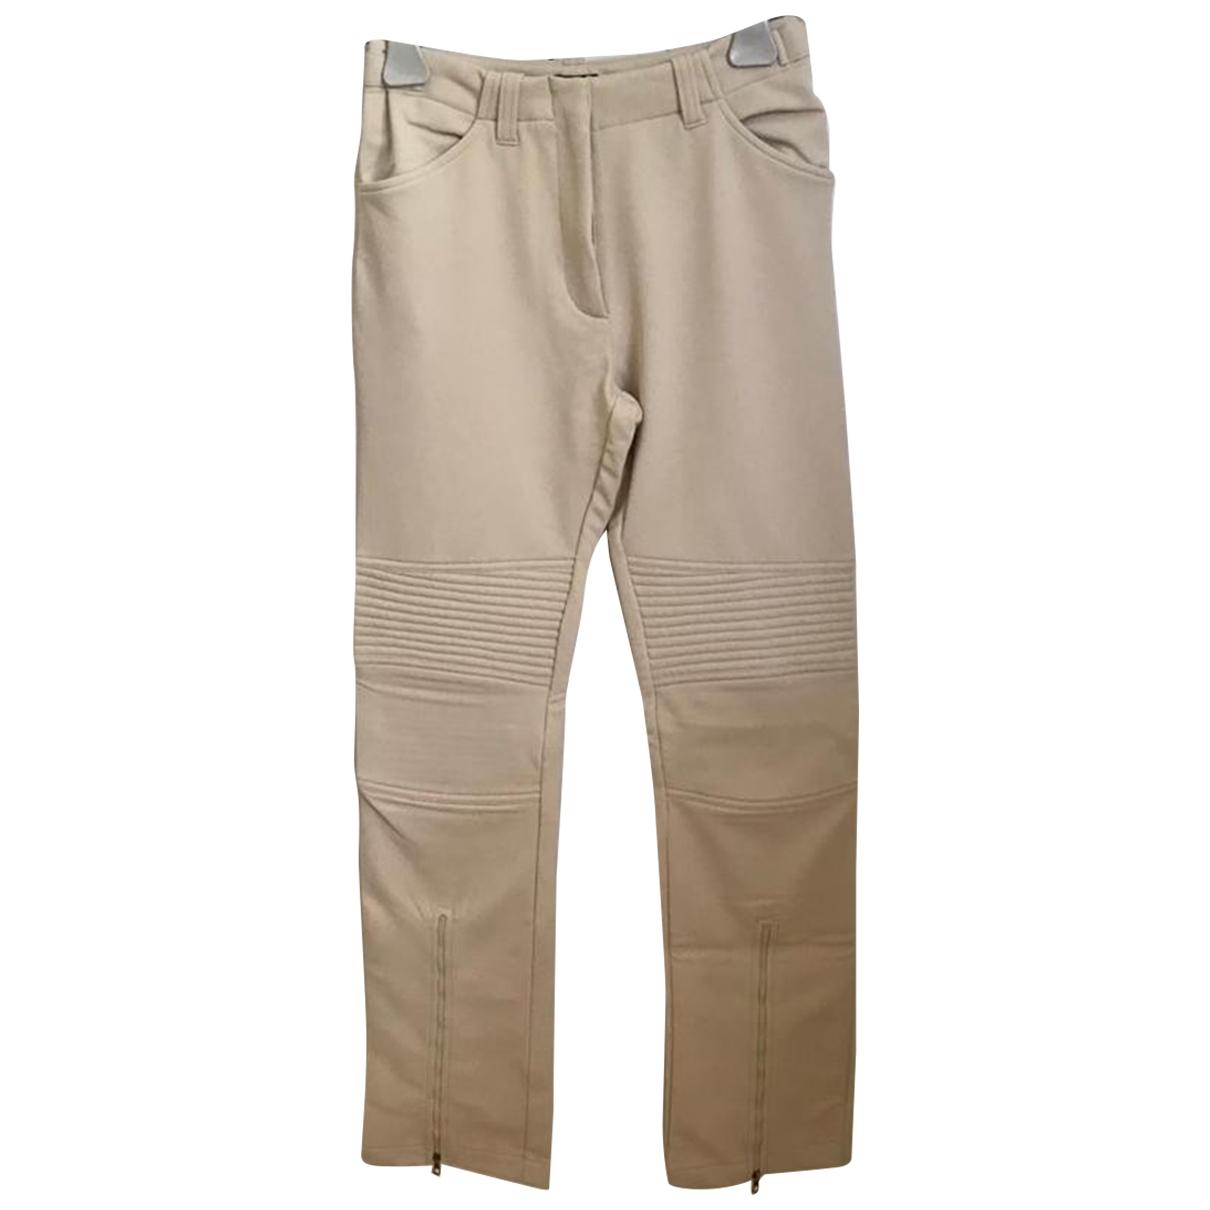 Moncler \N Ecru Trousers for Women 40 IT